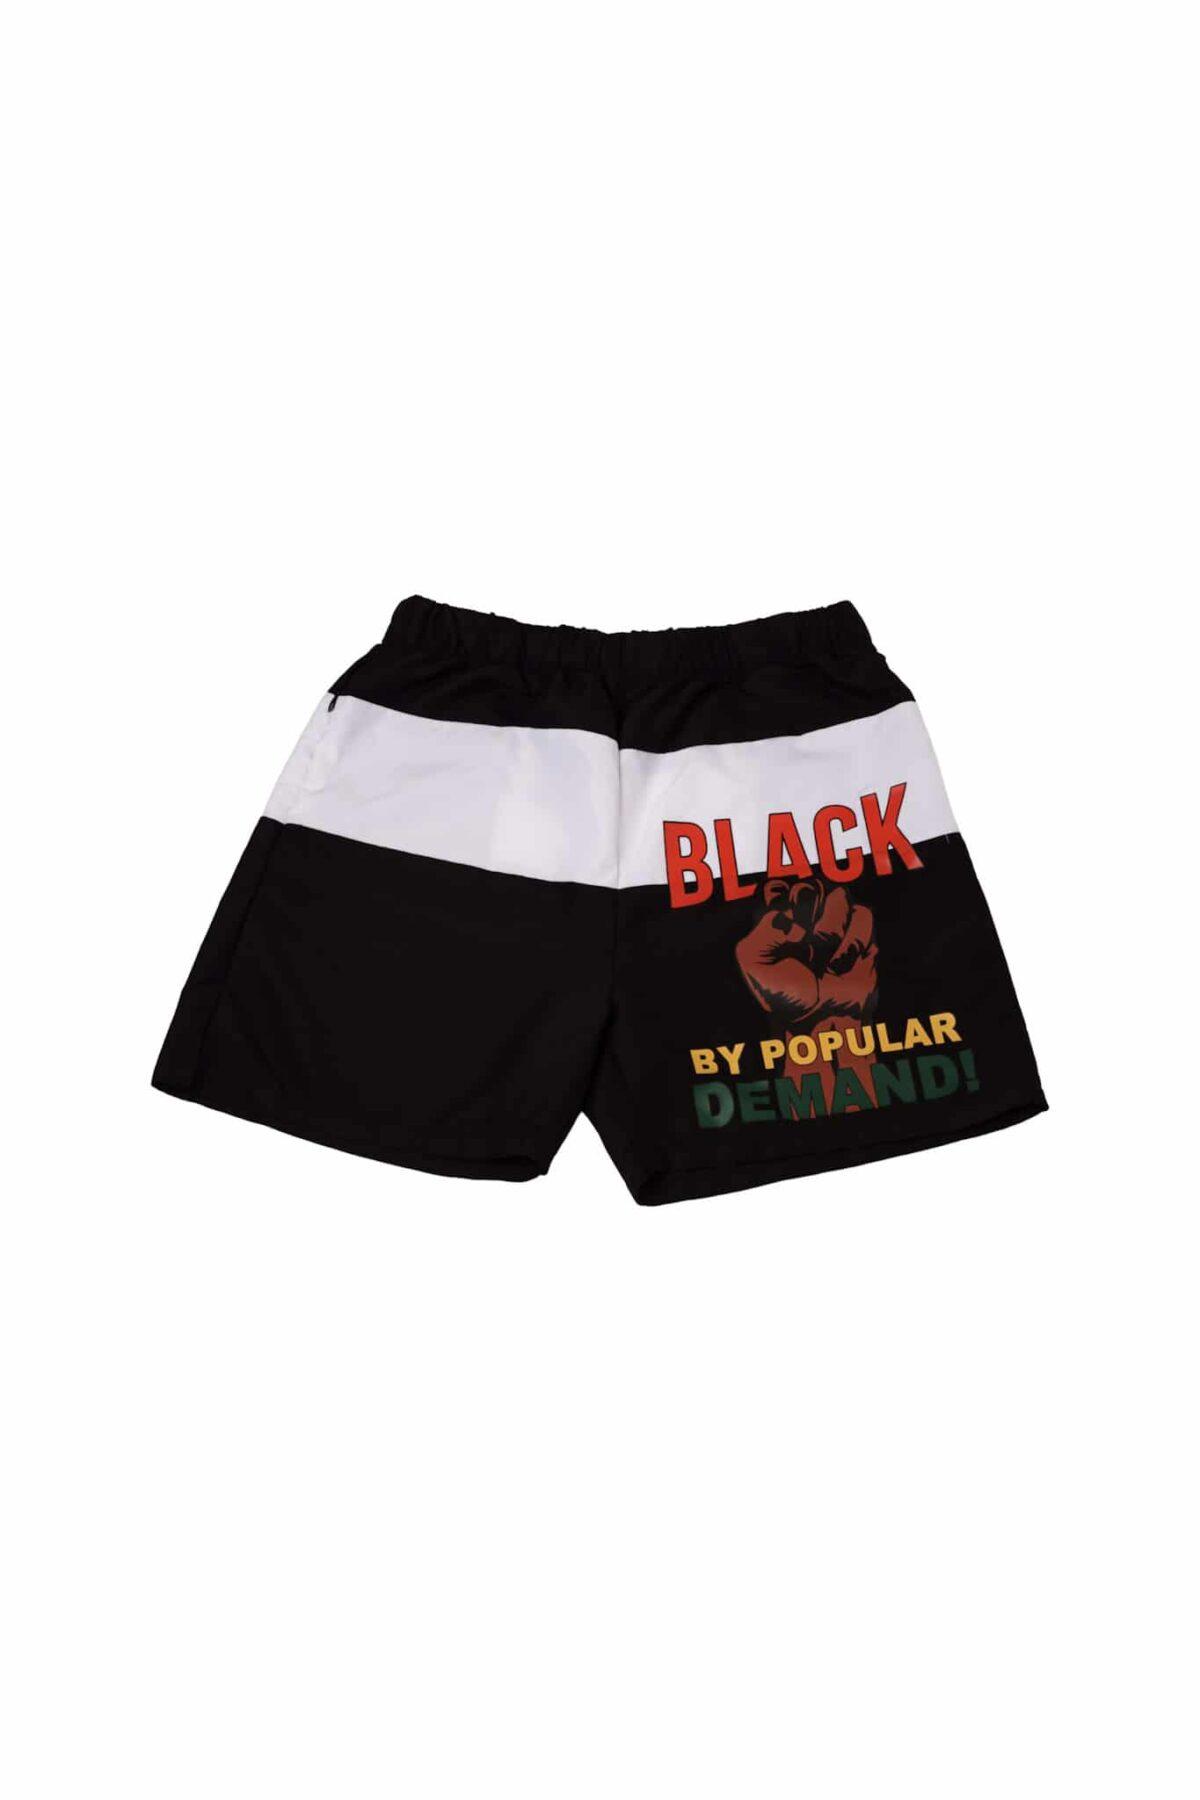 Black By Popular Demand® Unisex Black Board Shorts HGC Apparel